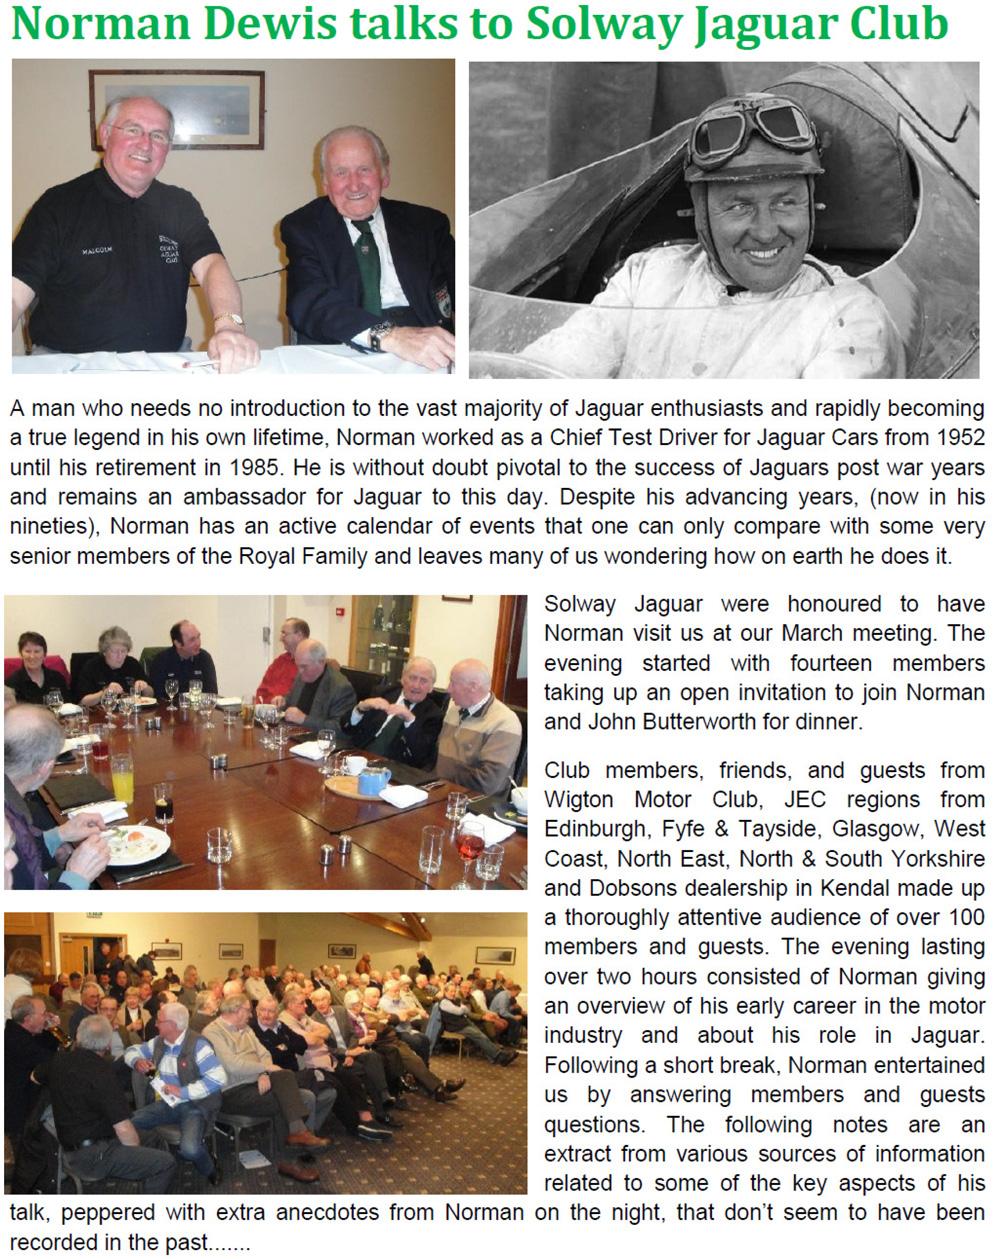 Norman Dewis visits Solway Jaguar